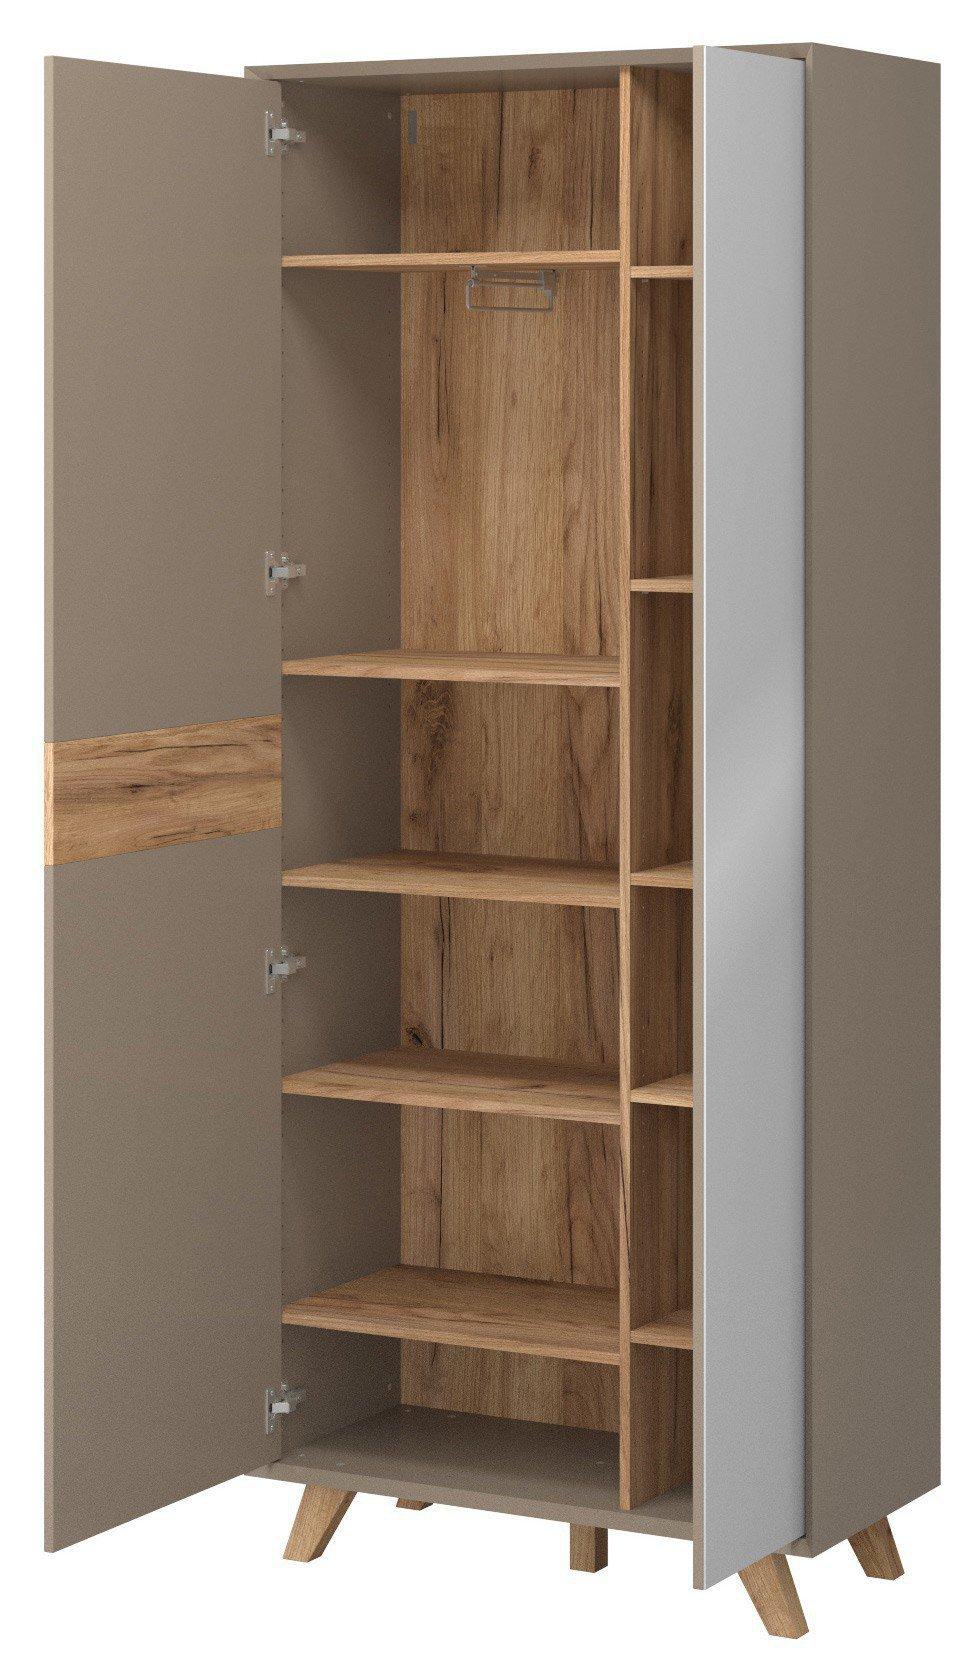 skandinavische m bel garderobe aleksi 2348 245 m bel letz ihr online shop. Black Bedroom Furniture Sets. Home Design Ideas